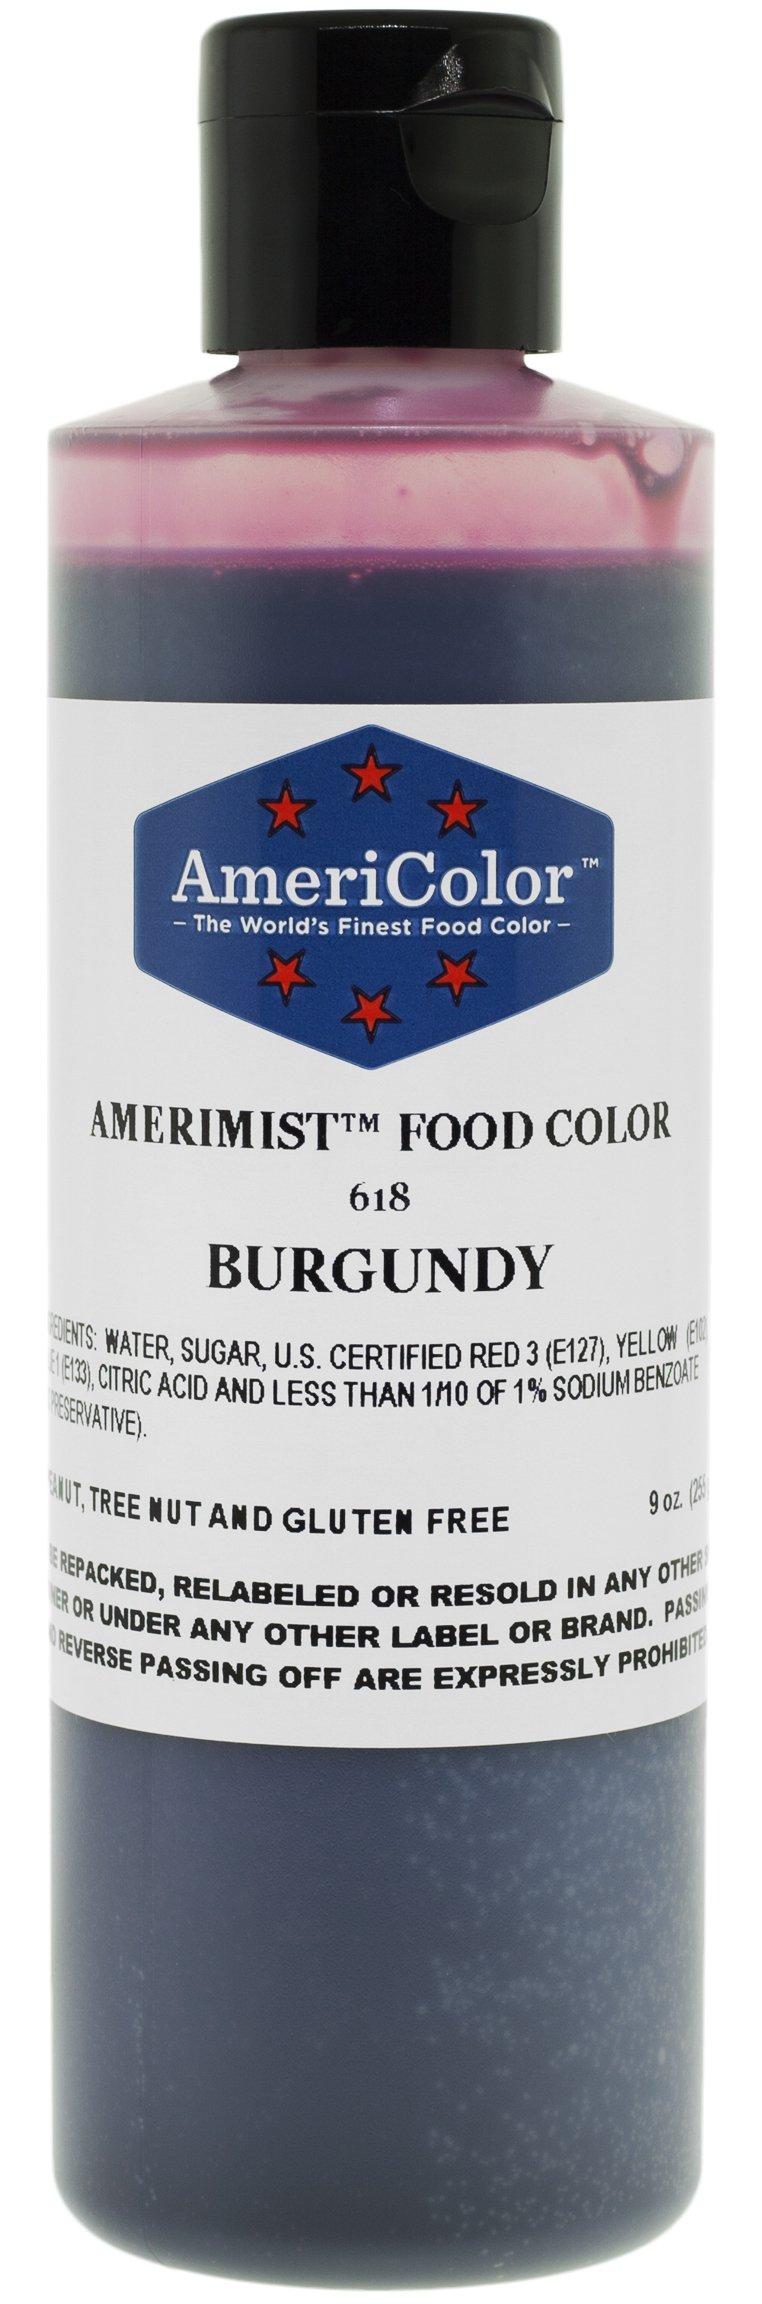 AmeriColor AmeriMist Burgundy Airbrush Food Color, 9 oz